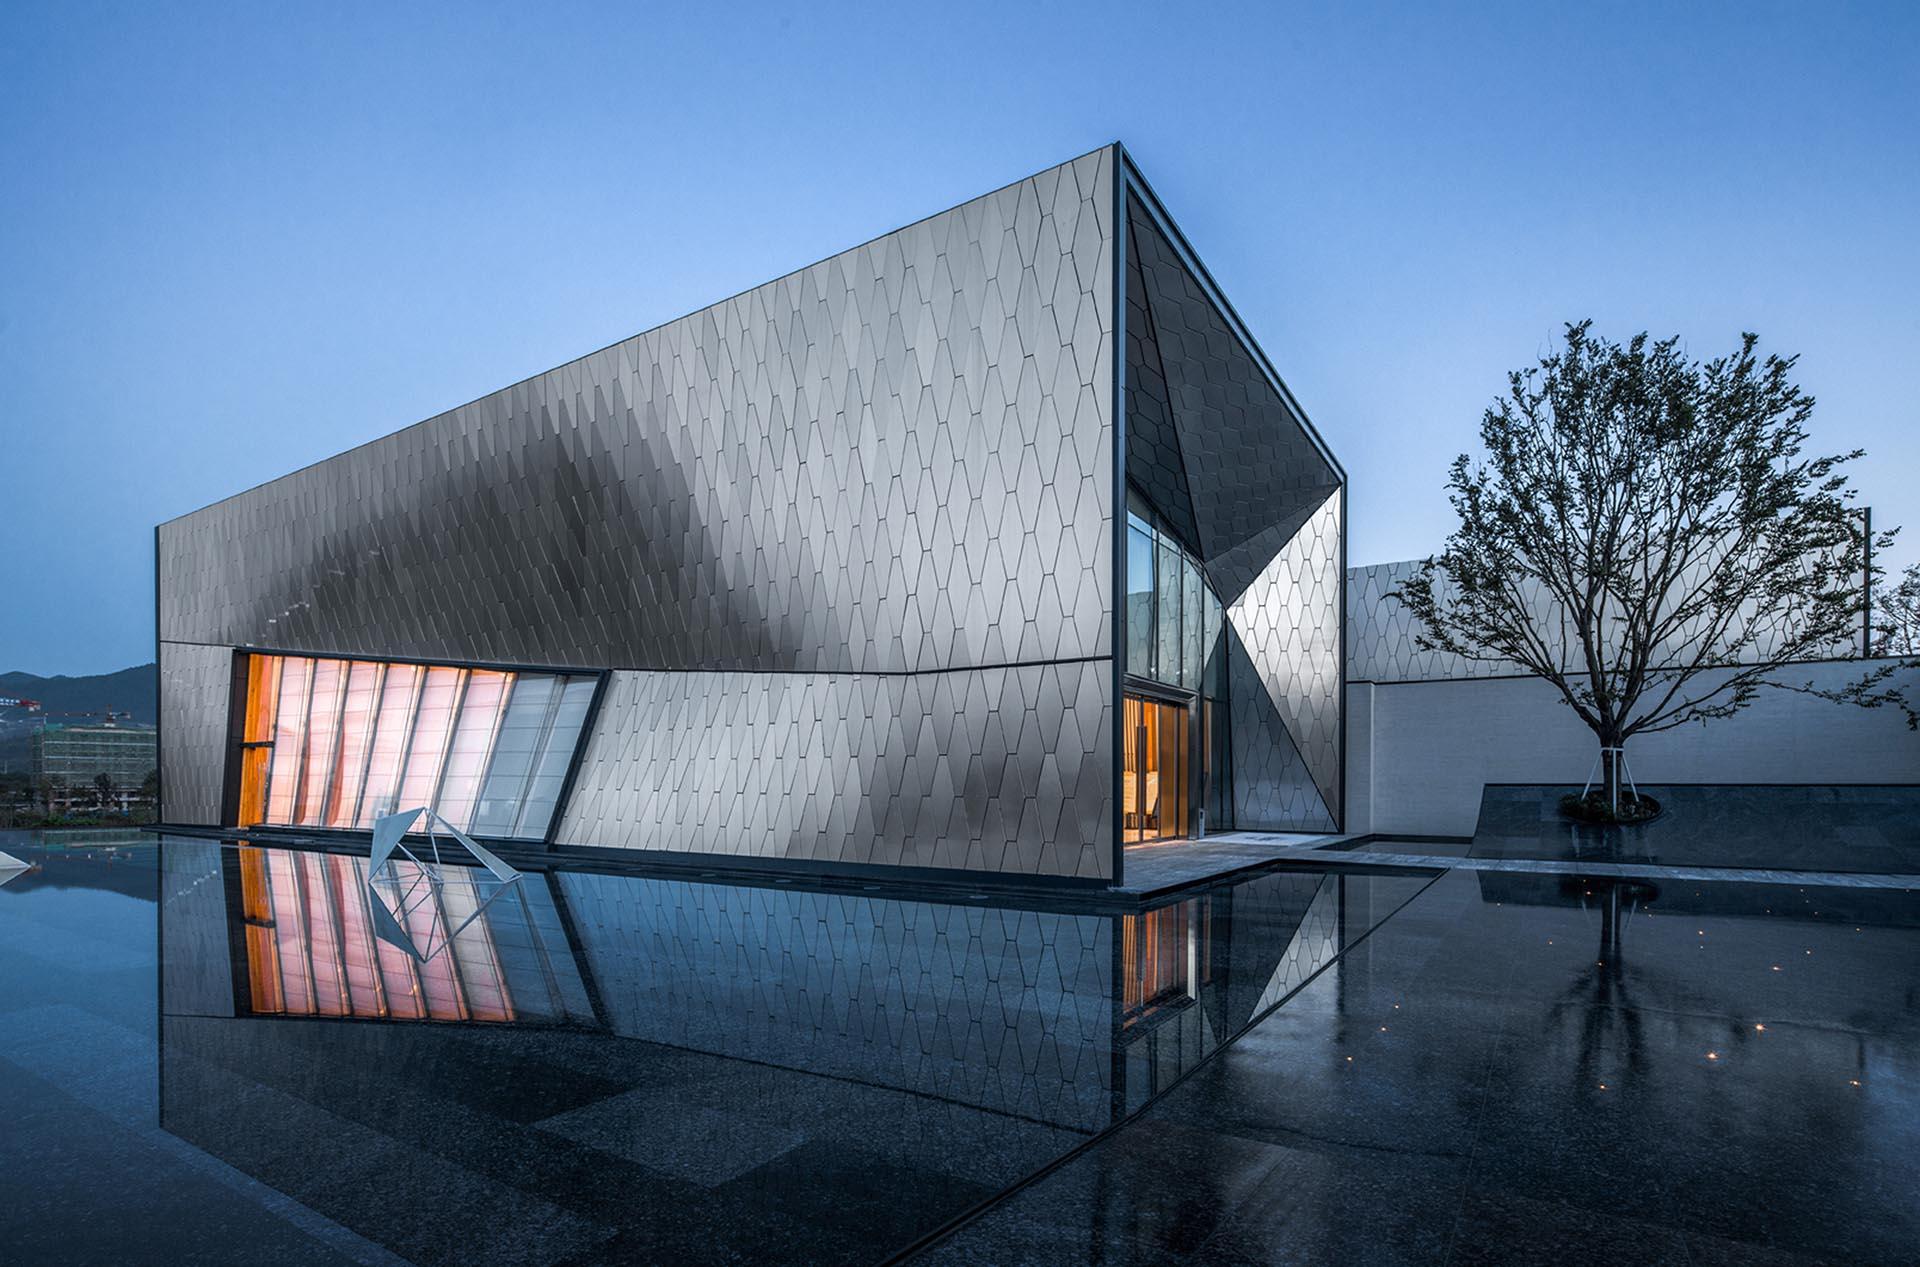 Yuanlu Community Center by JIE LEE